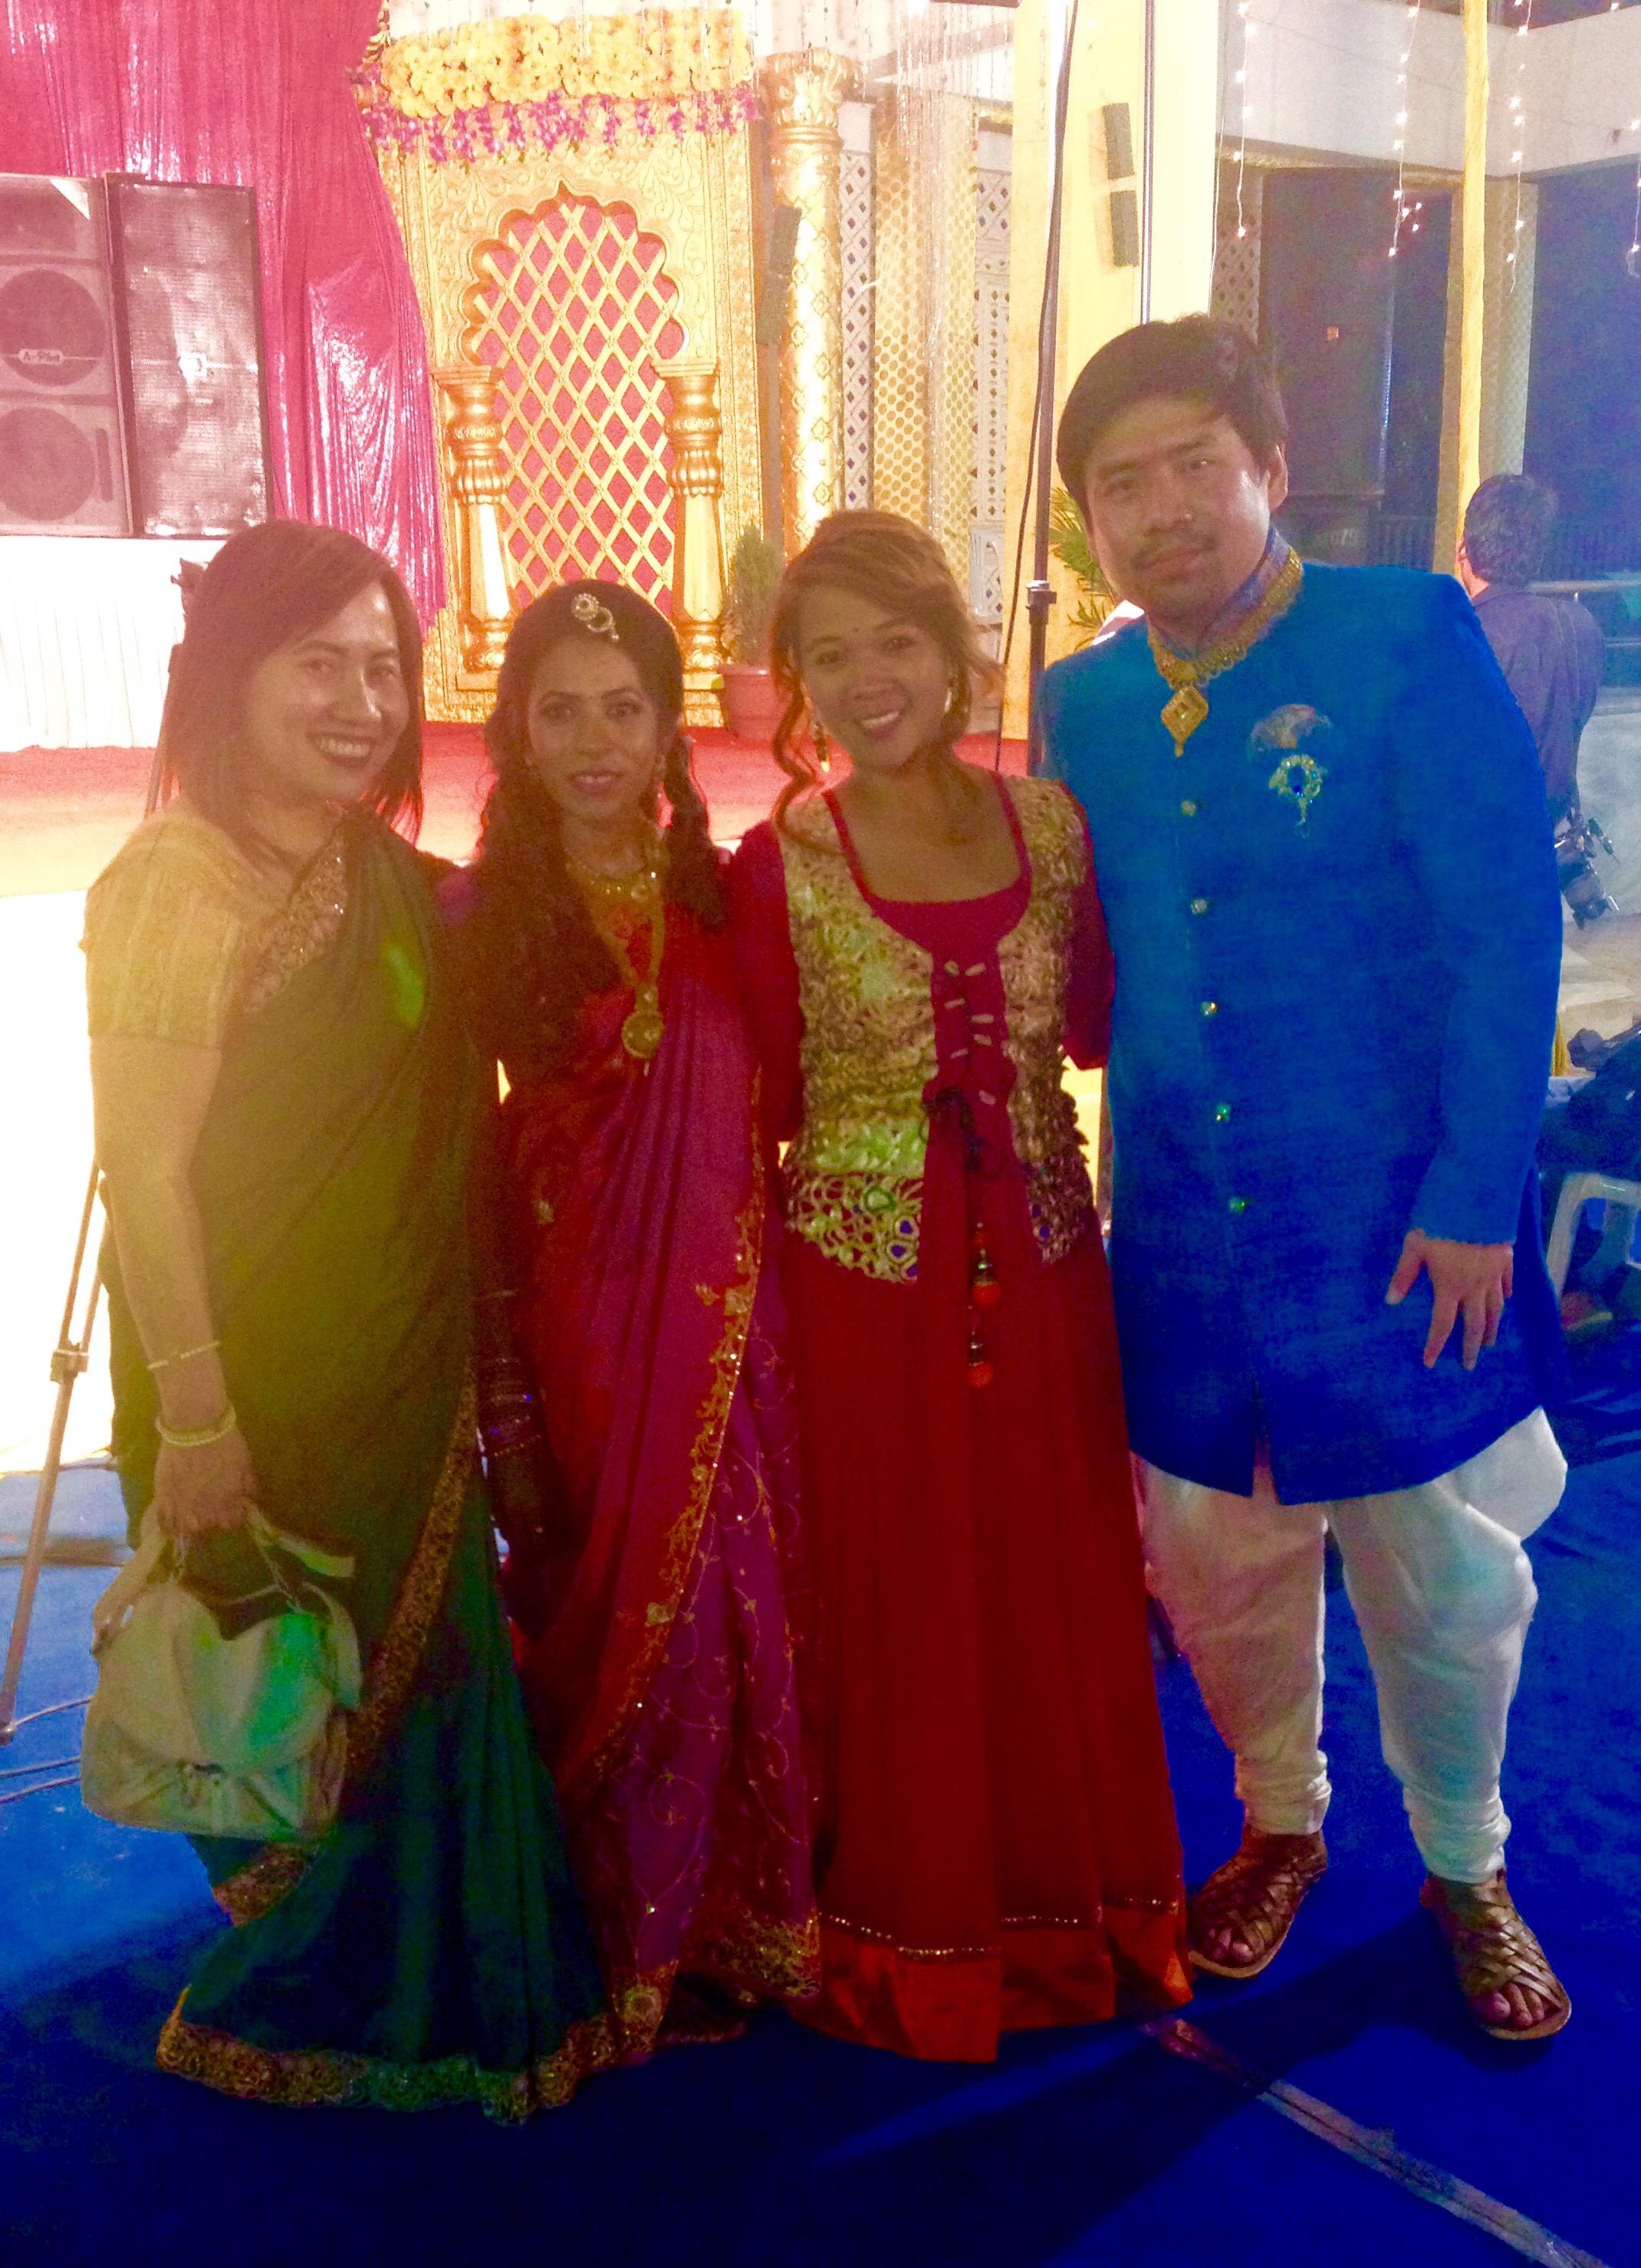 The Indian Wedding | Your Not So Ordinary Ryshel